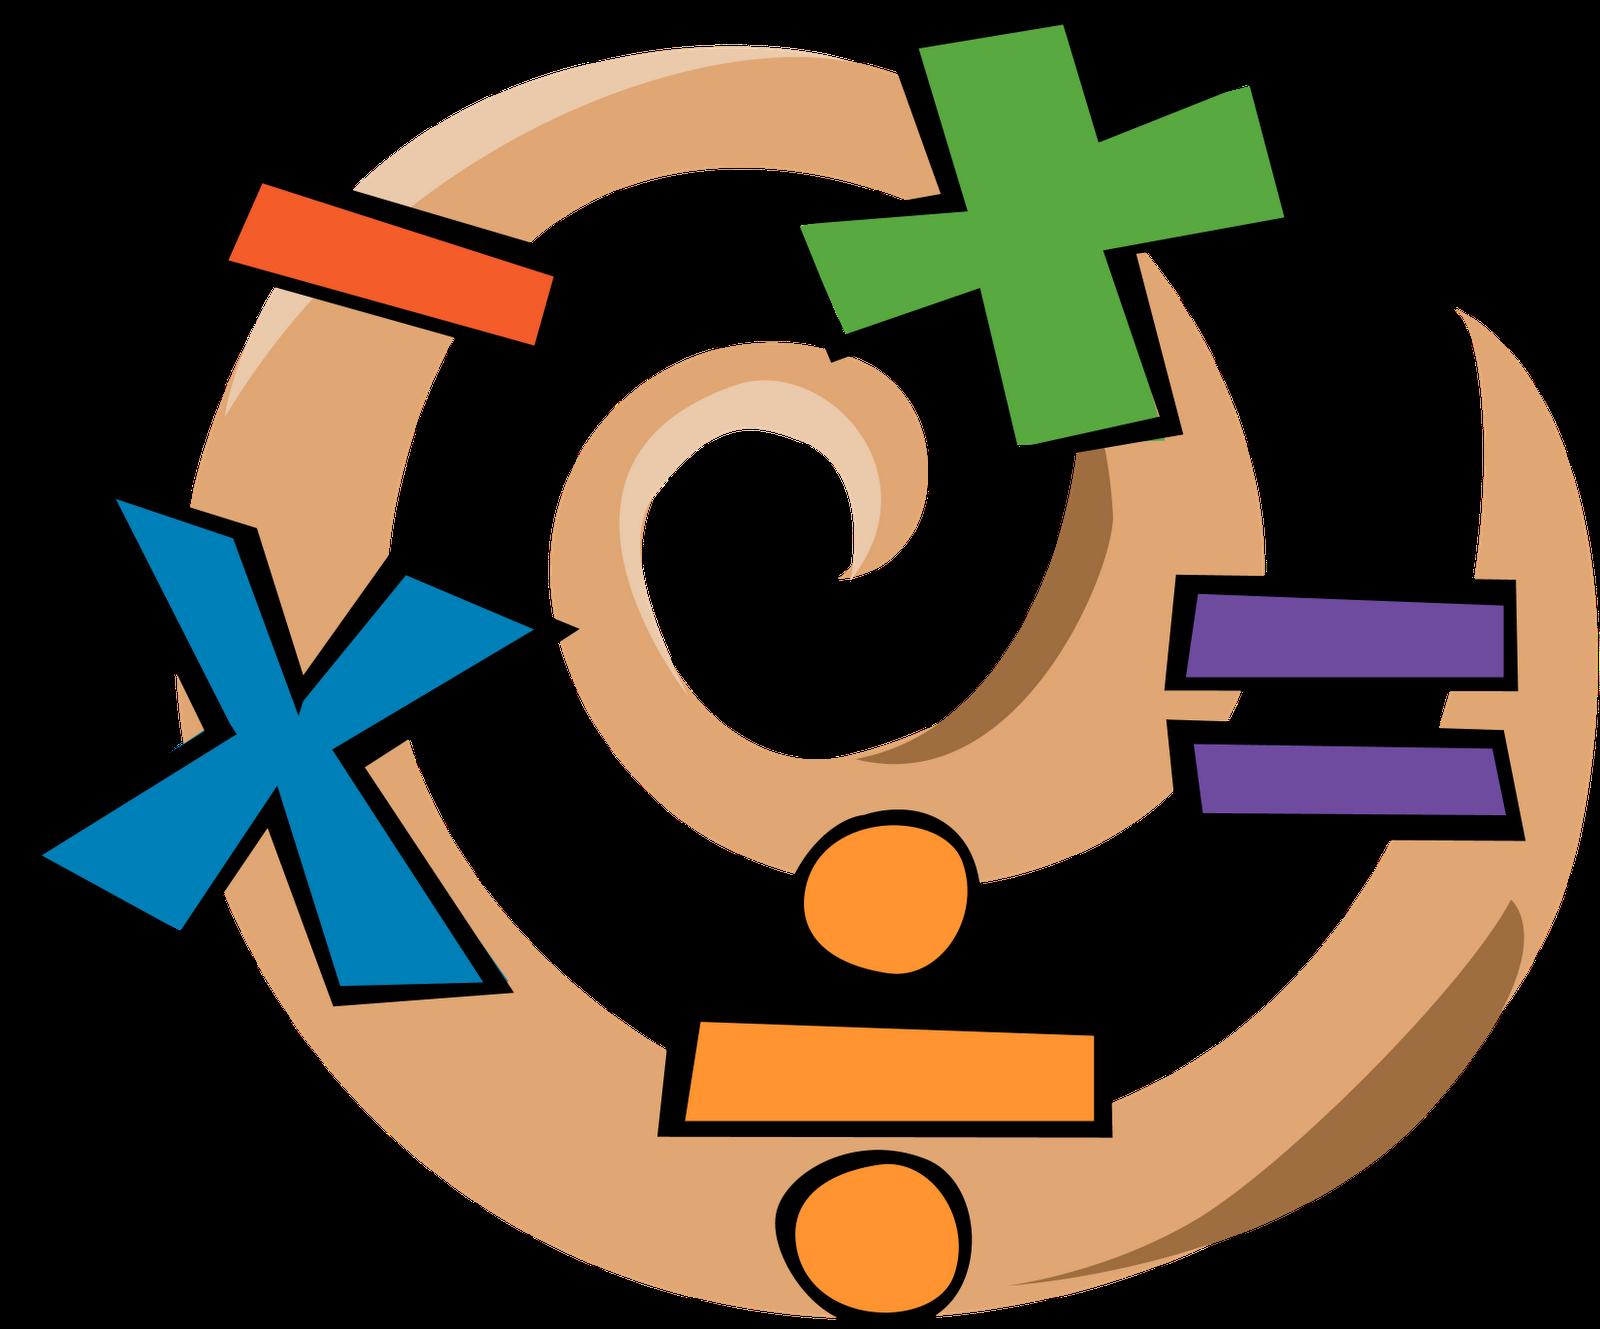 Algebra clipart. Symbols